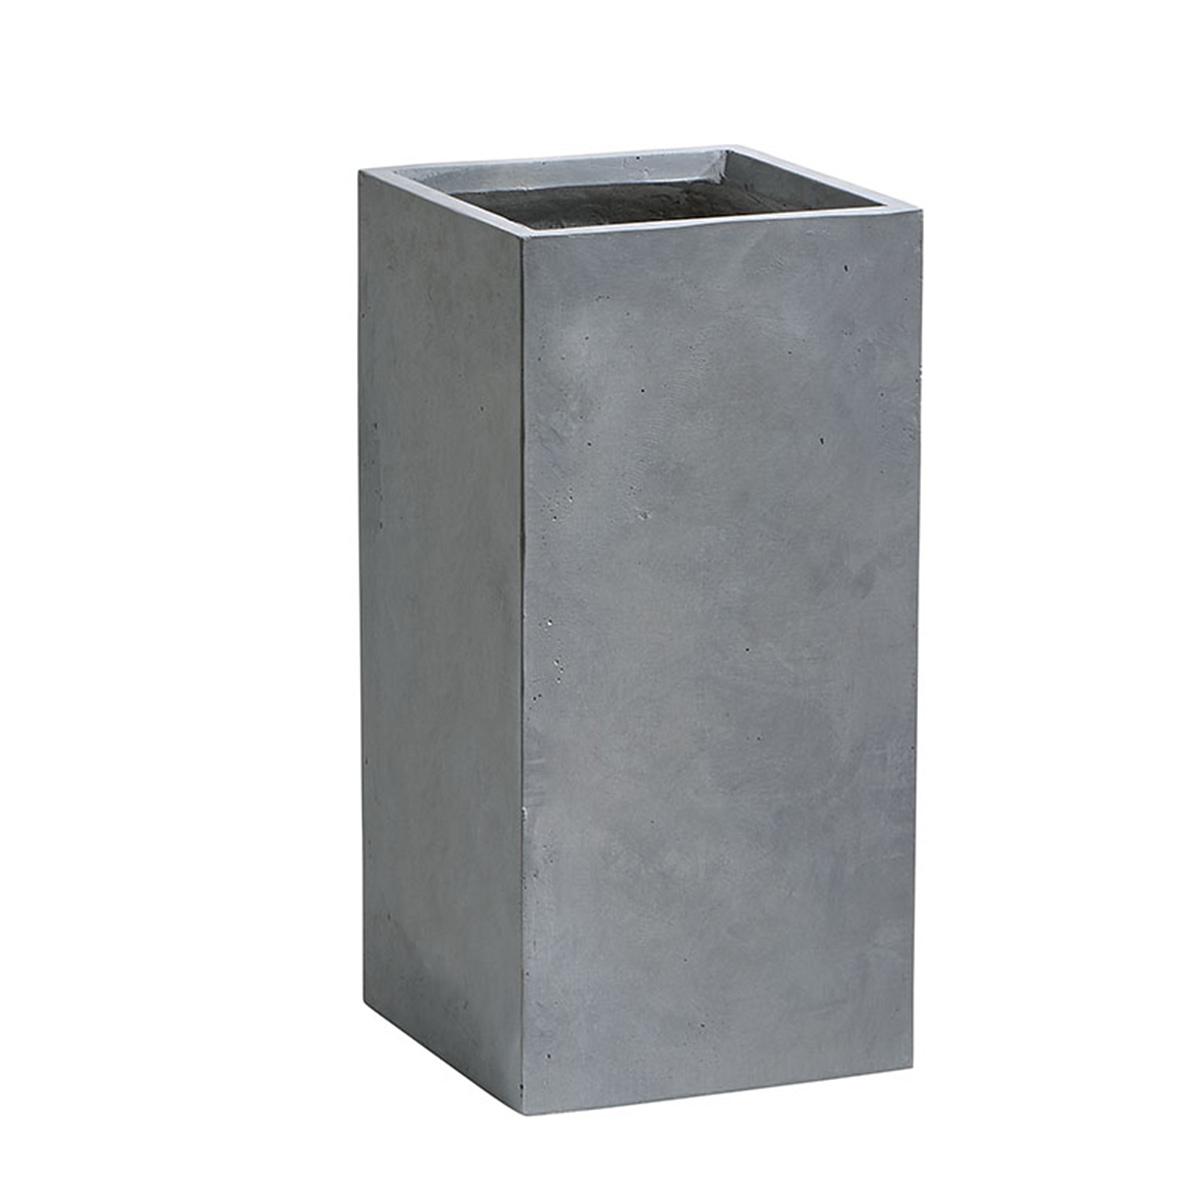 pflanzkübel fiberglas 34 x 34 x 70 (l x b x h), grau - gartenfreude